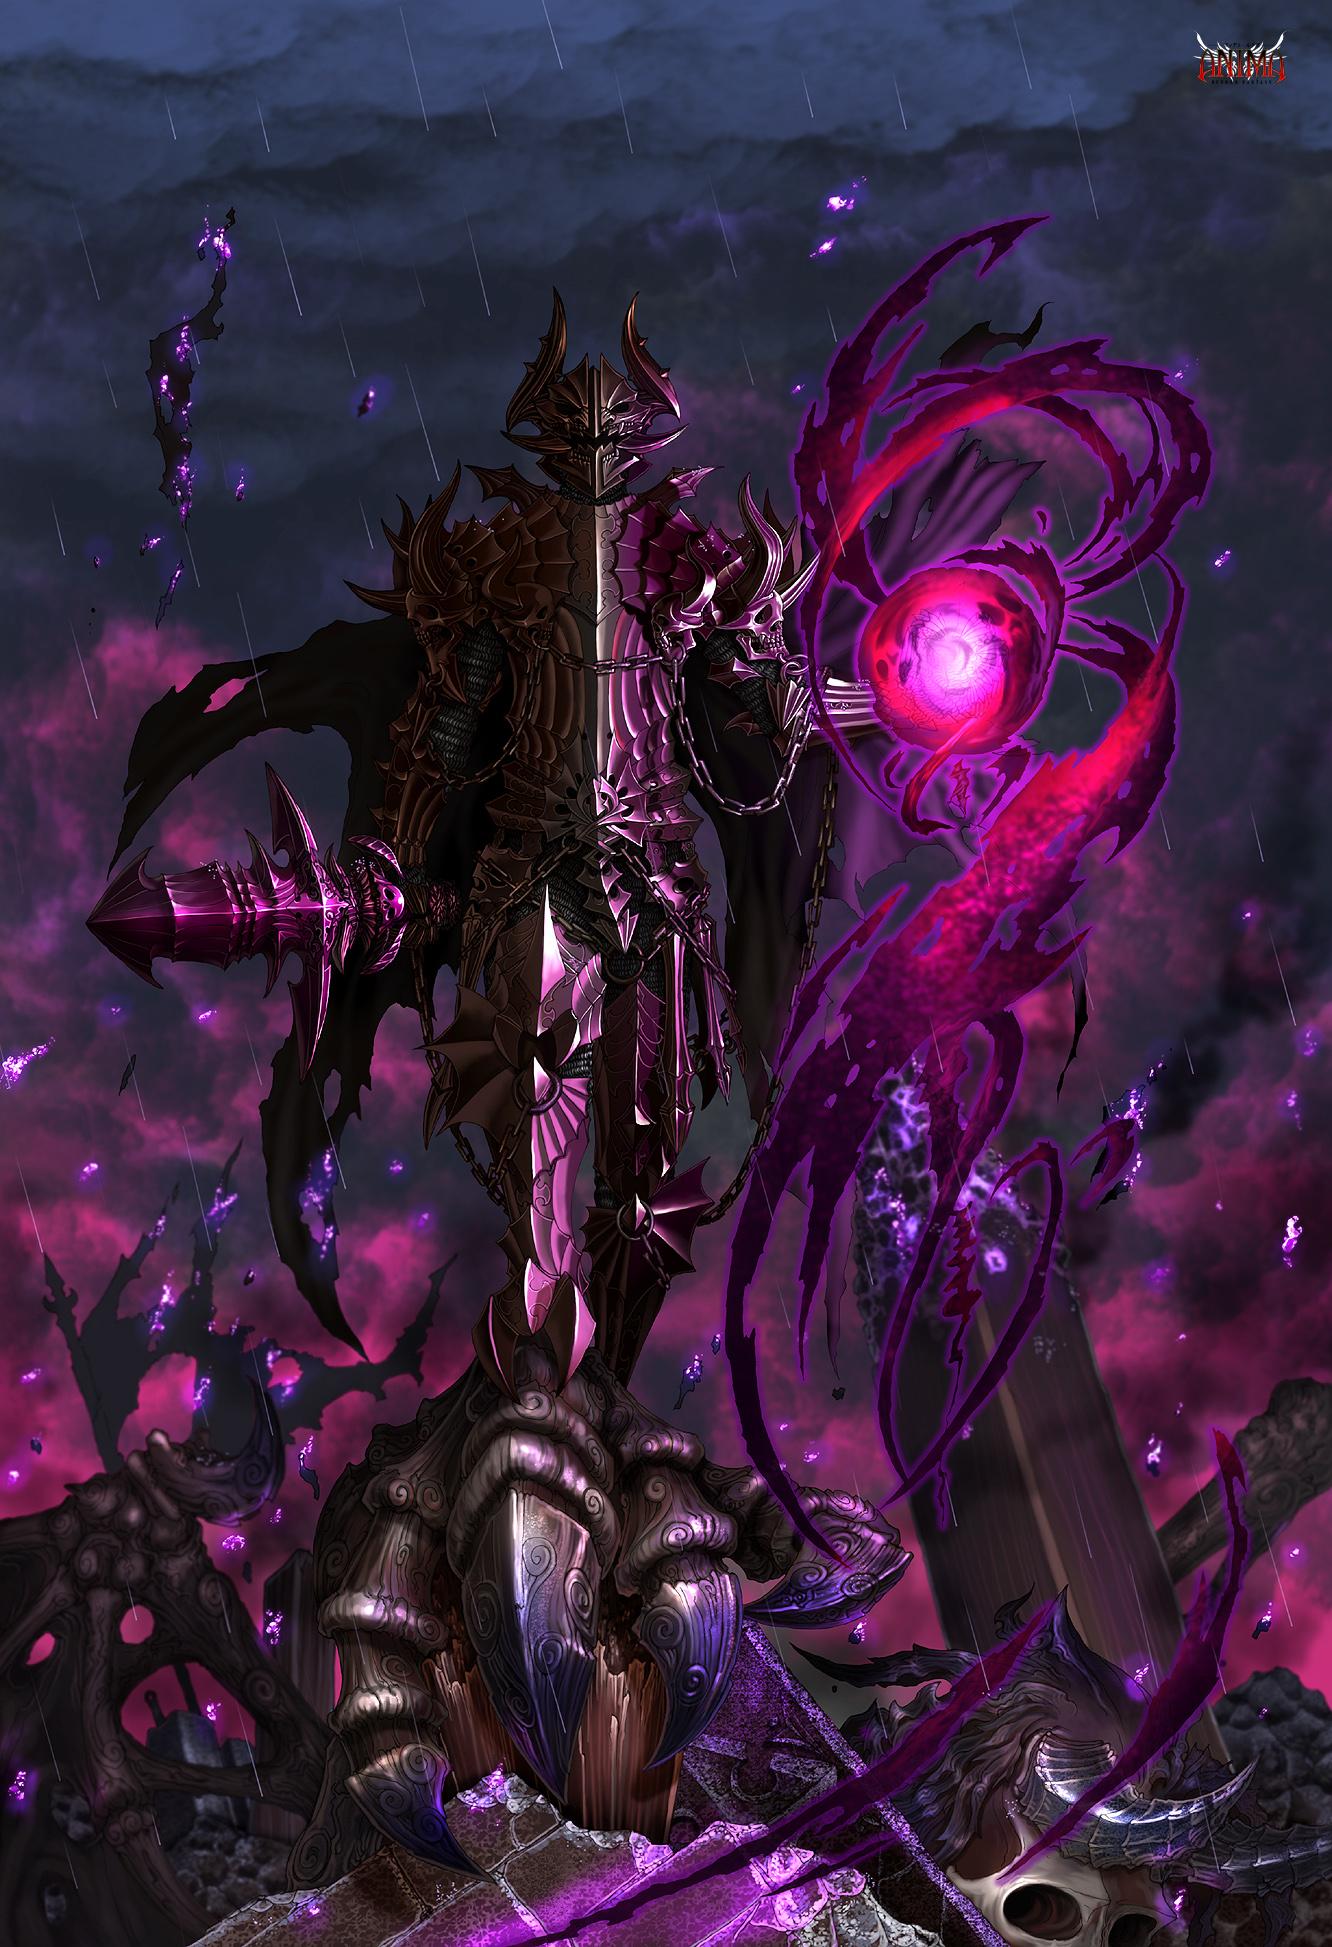 Anima: Alastor the Arbiter by Wen-M